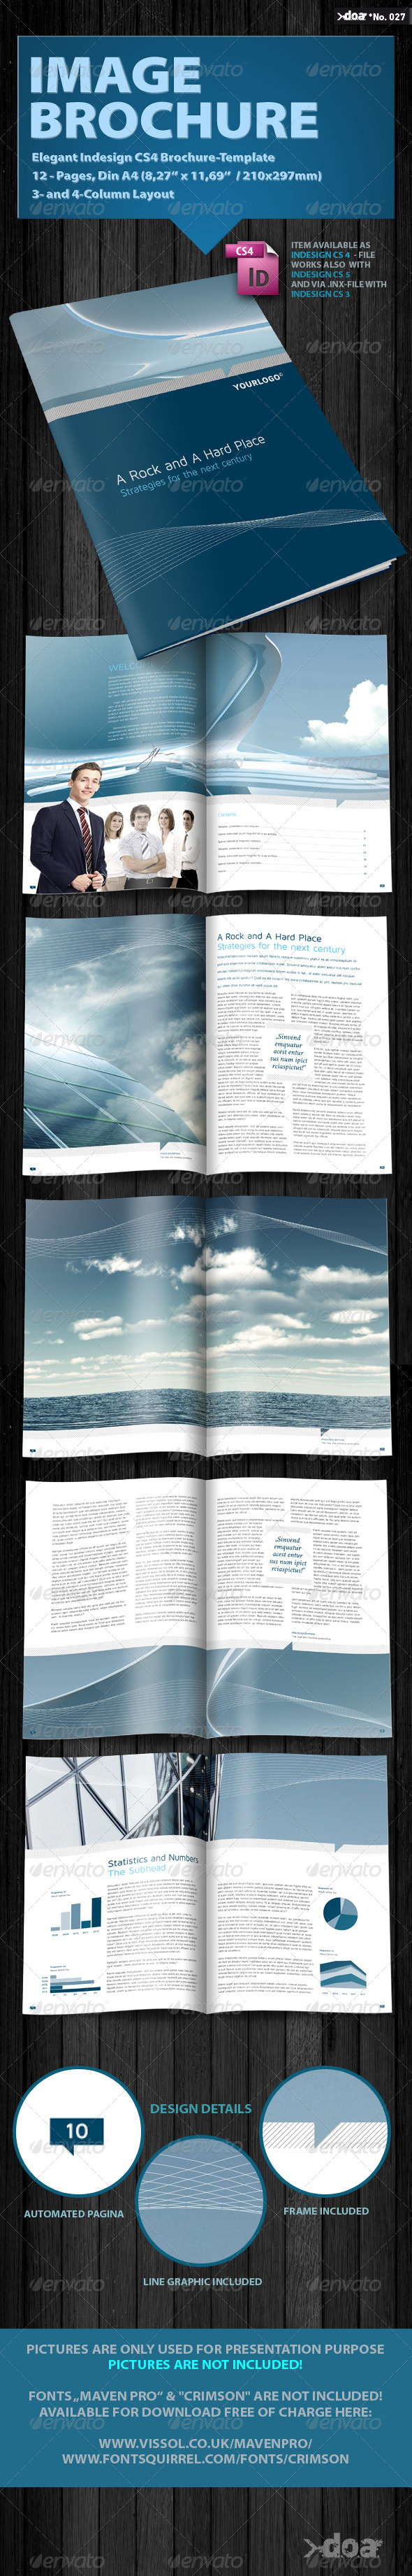 GraphicRiver Elegant Image Brochure 506117